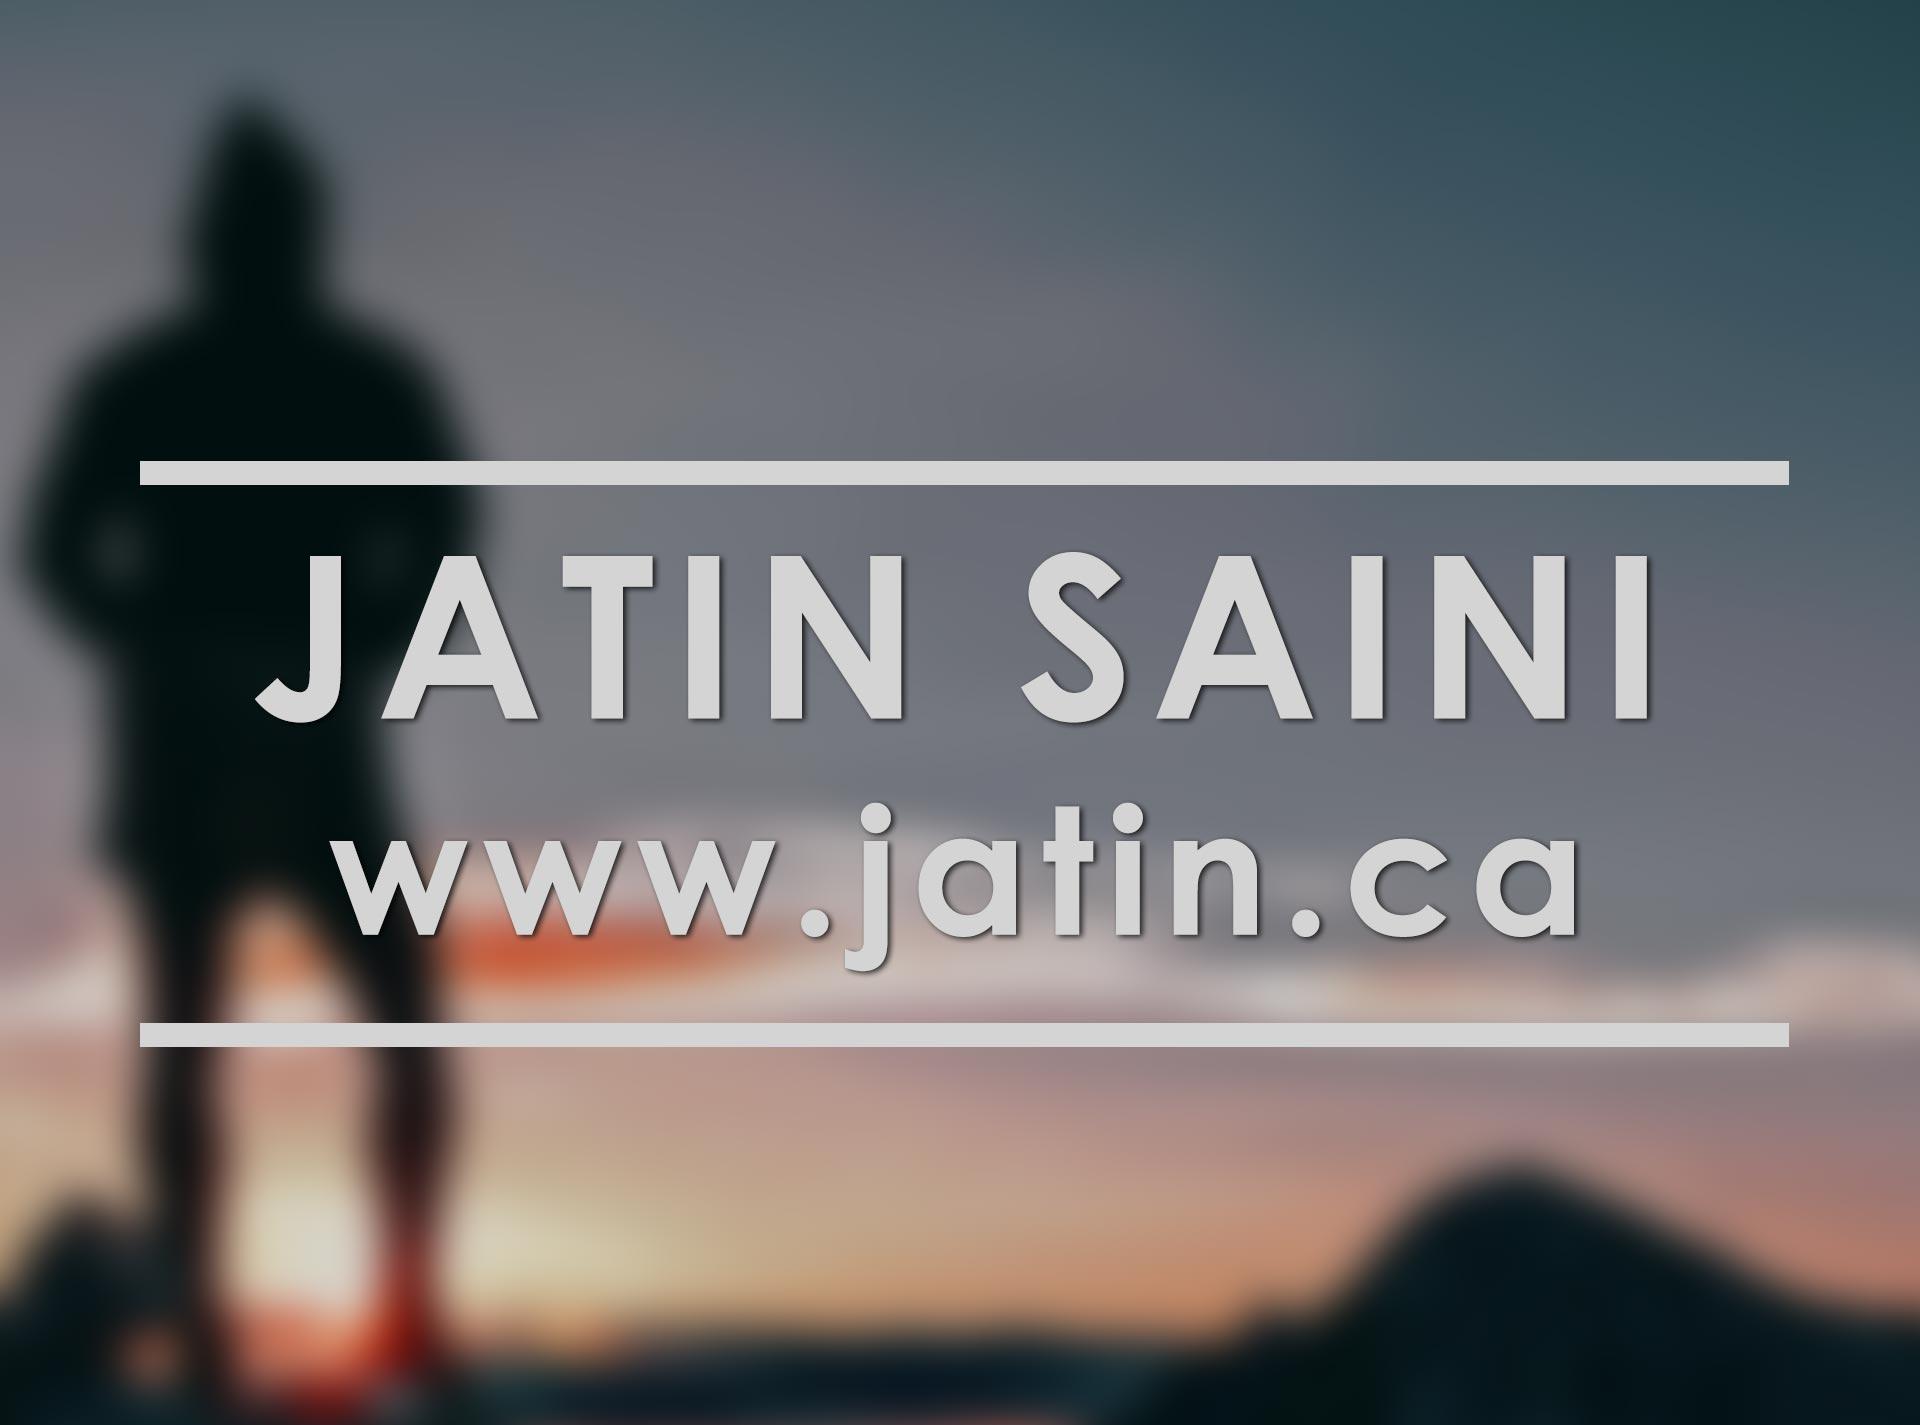 Jatin Saini